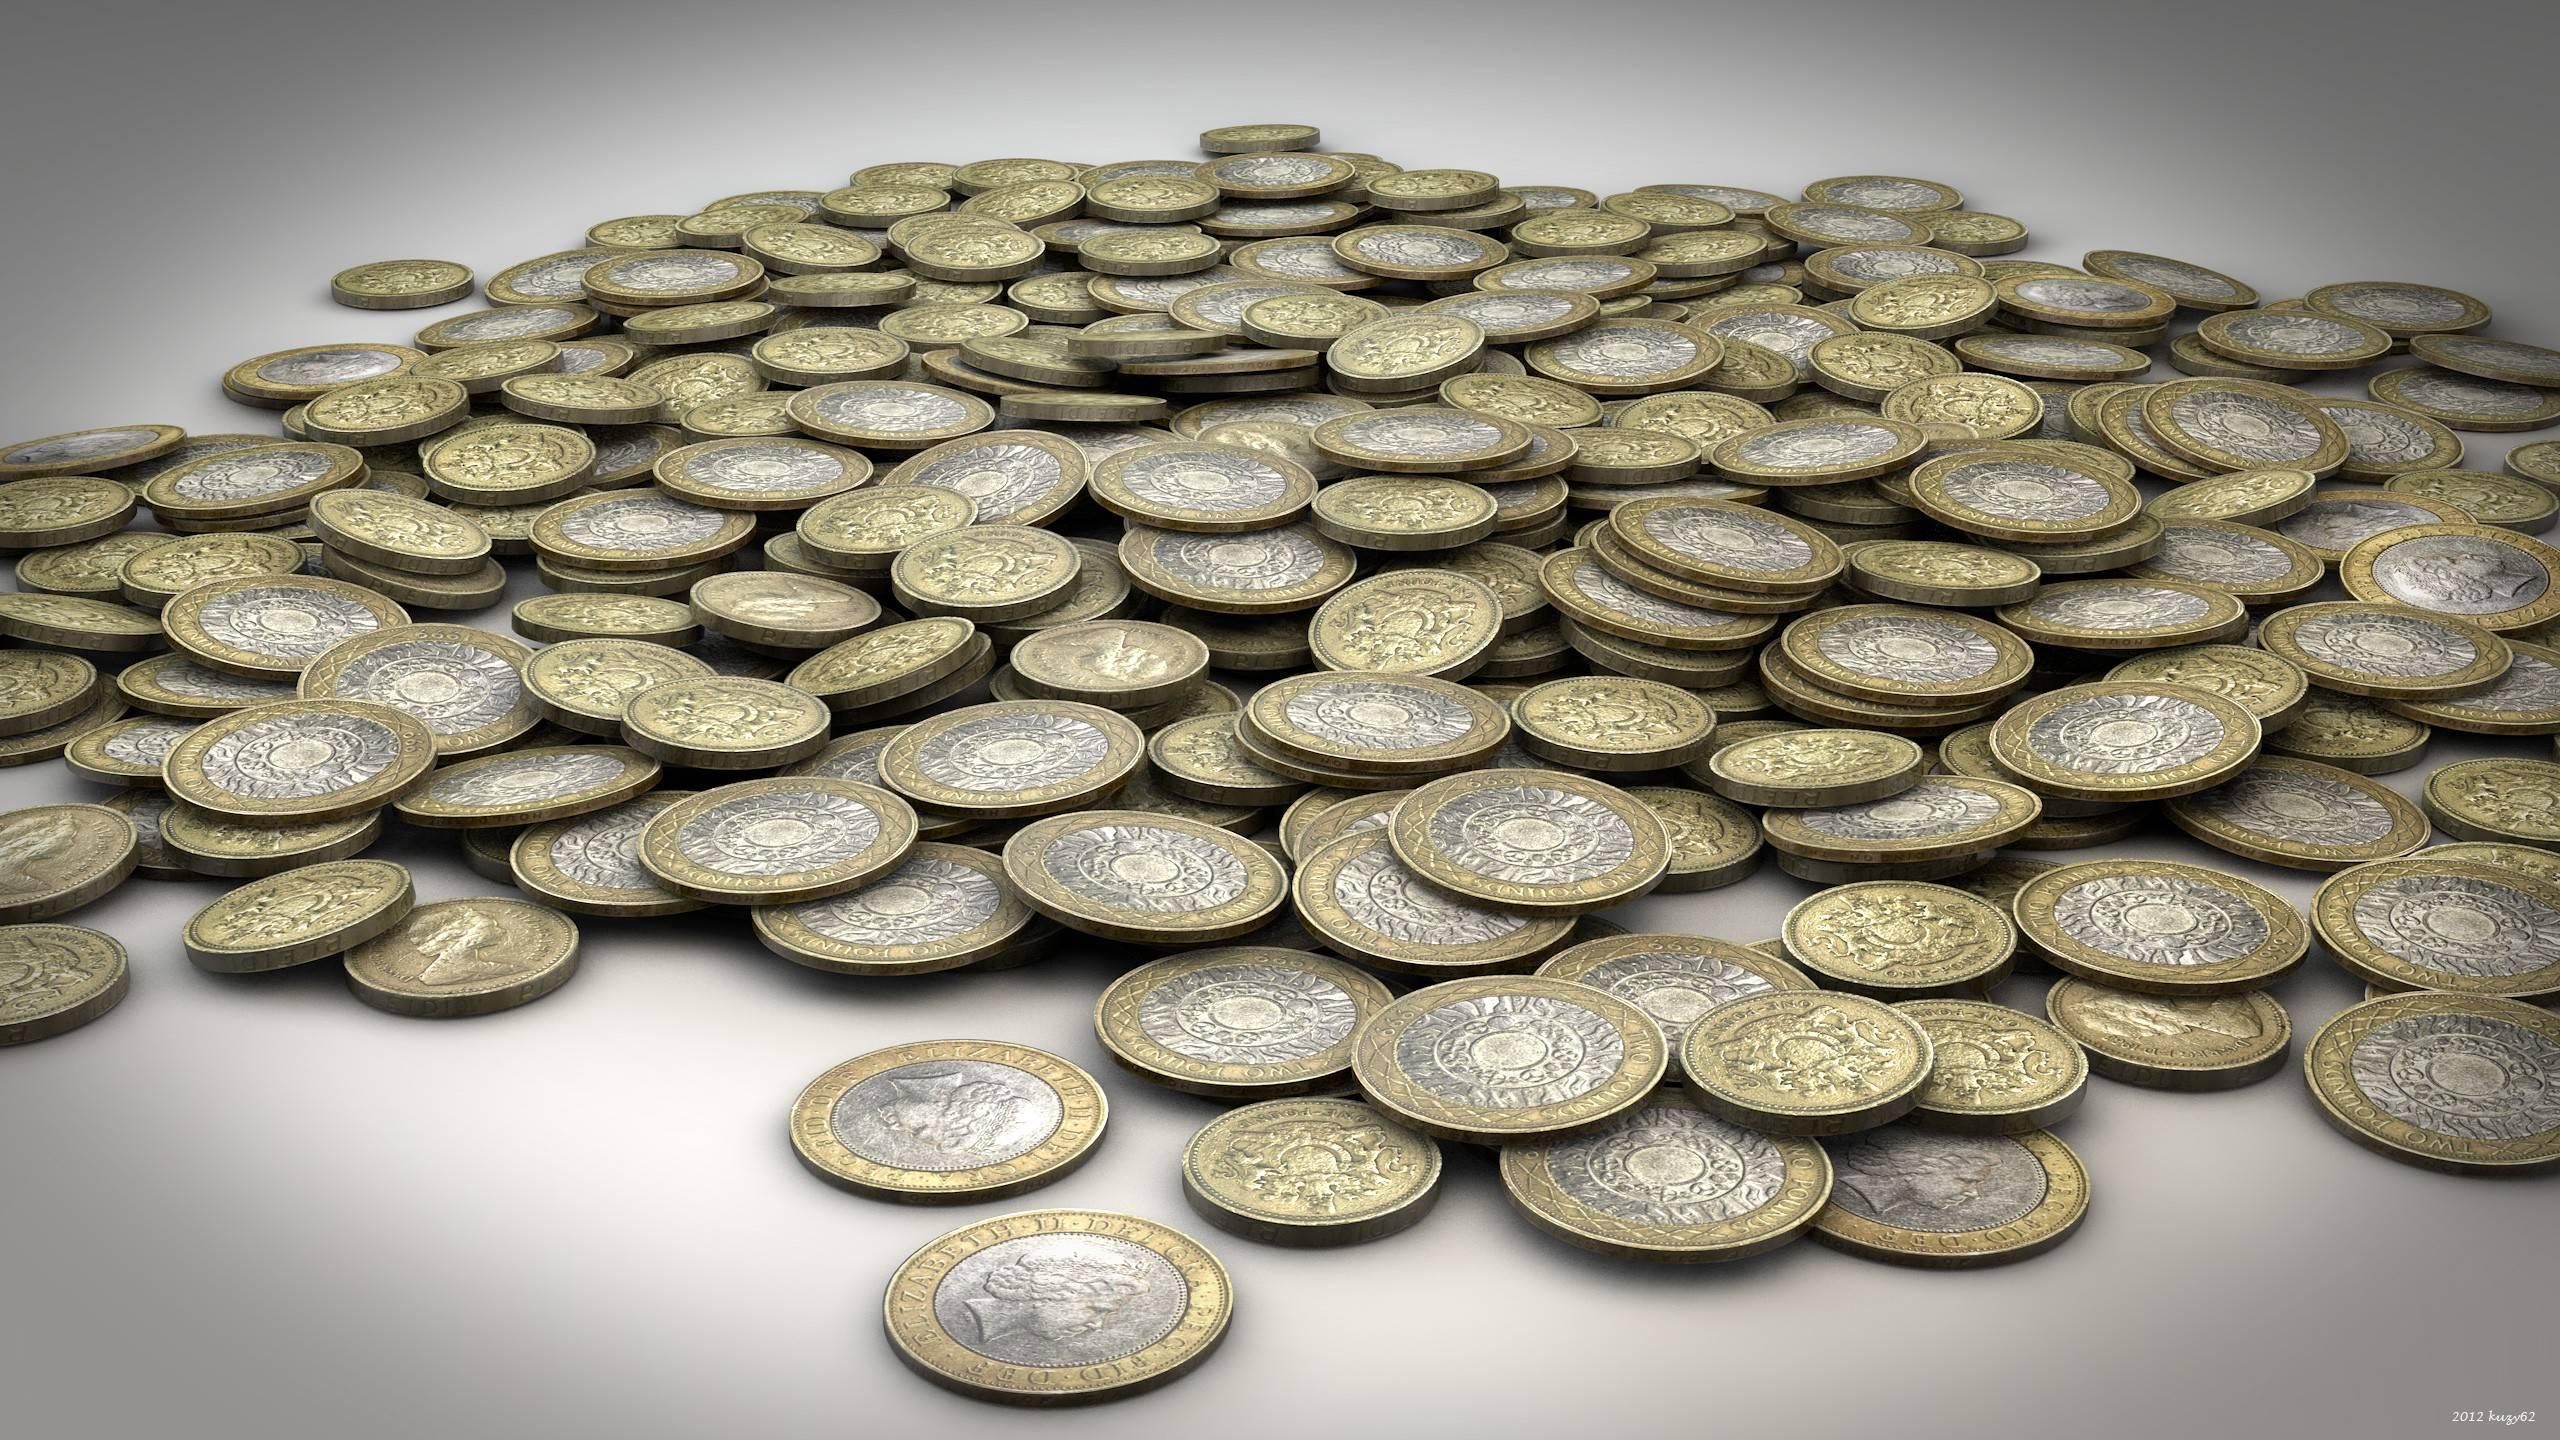 обои монеты, деньги картинки фото